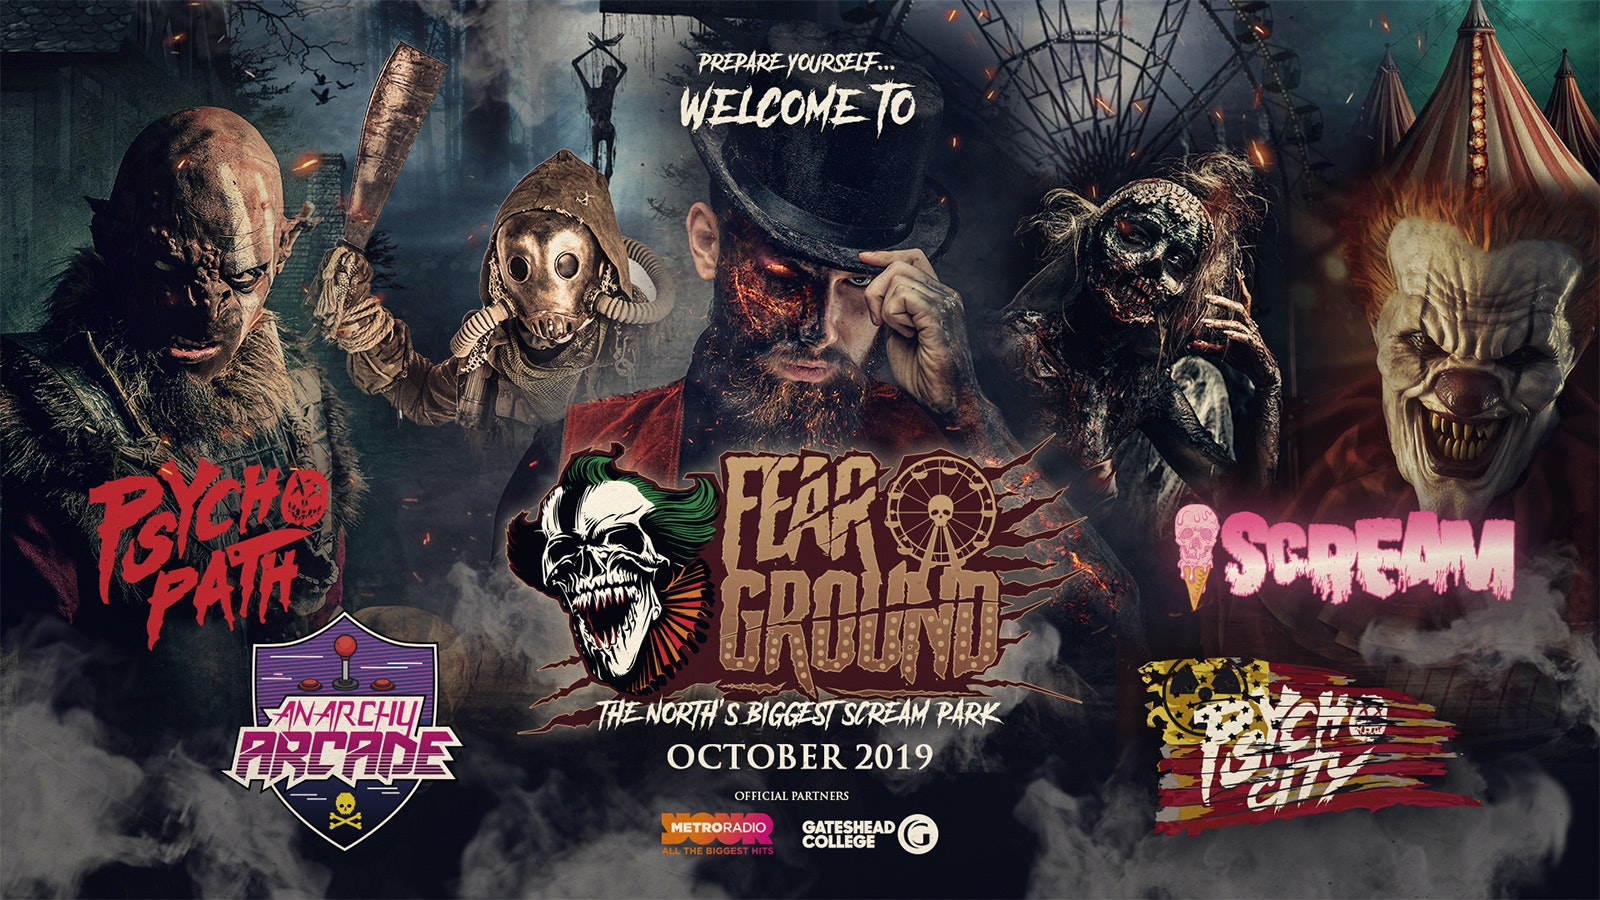 Psycho Path – Sunday 20th October 2019